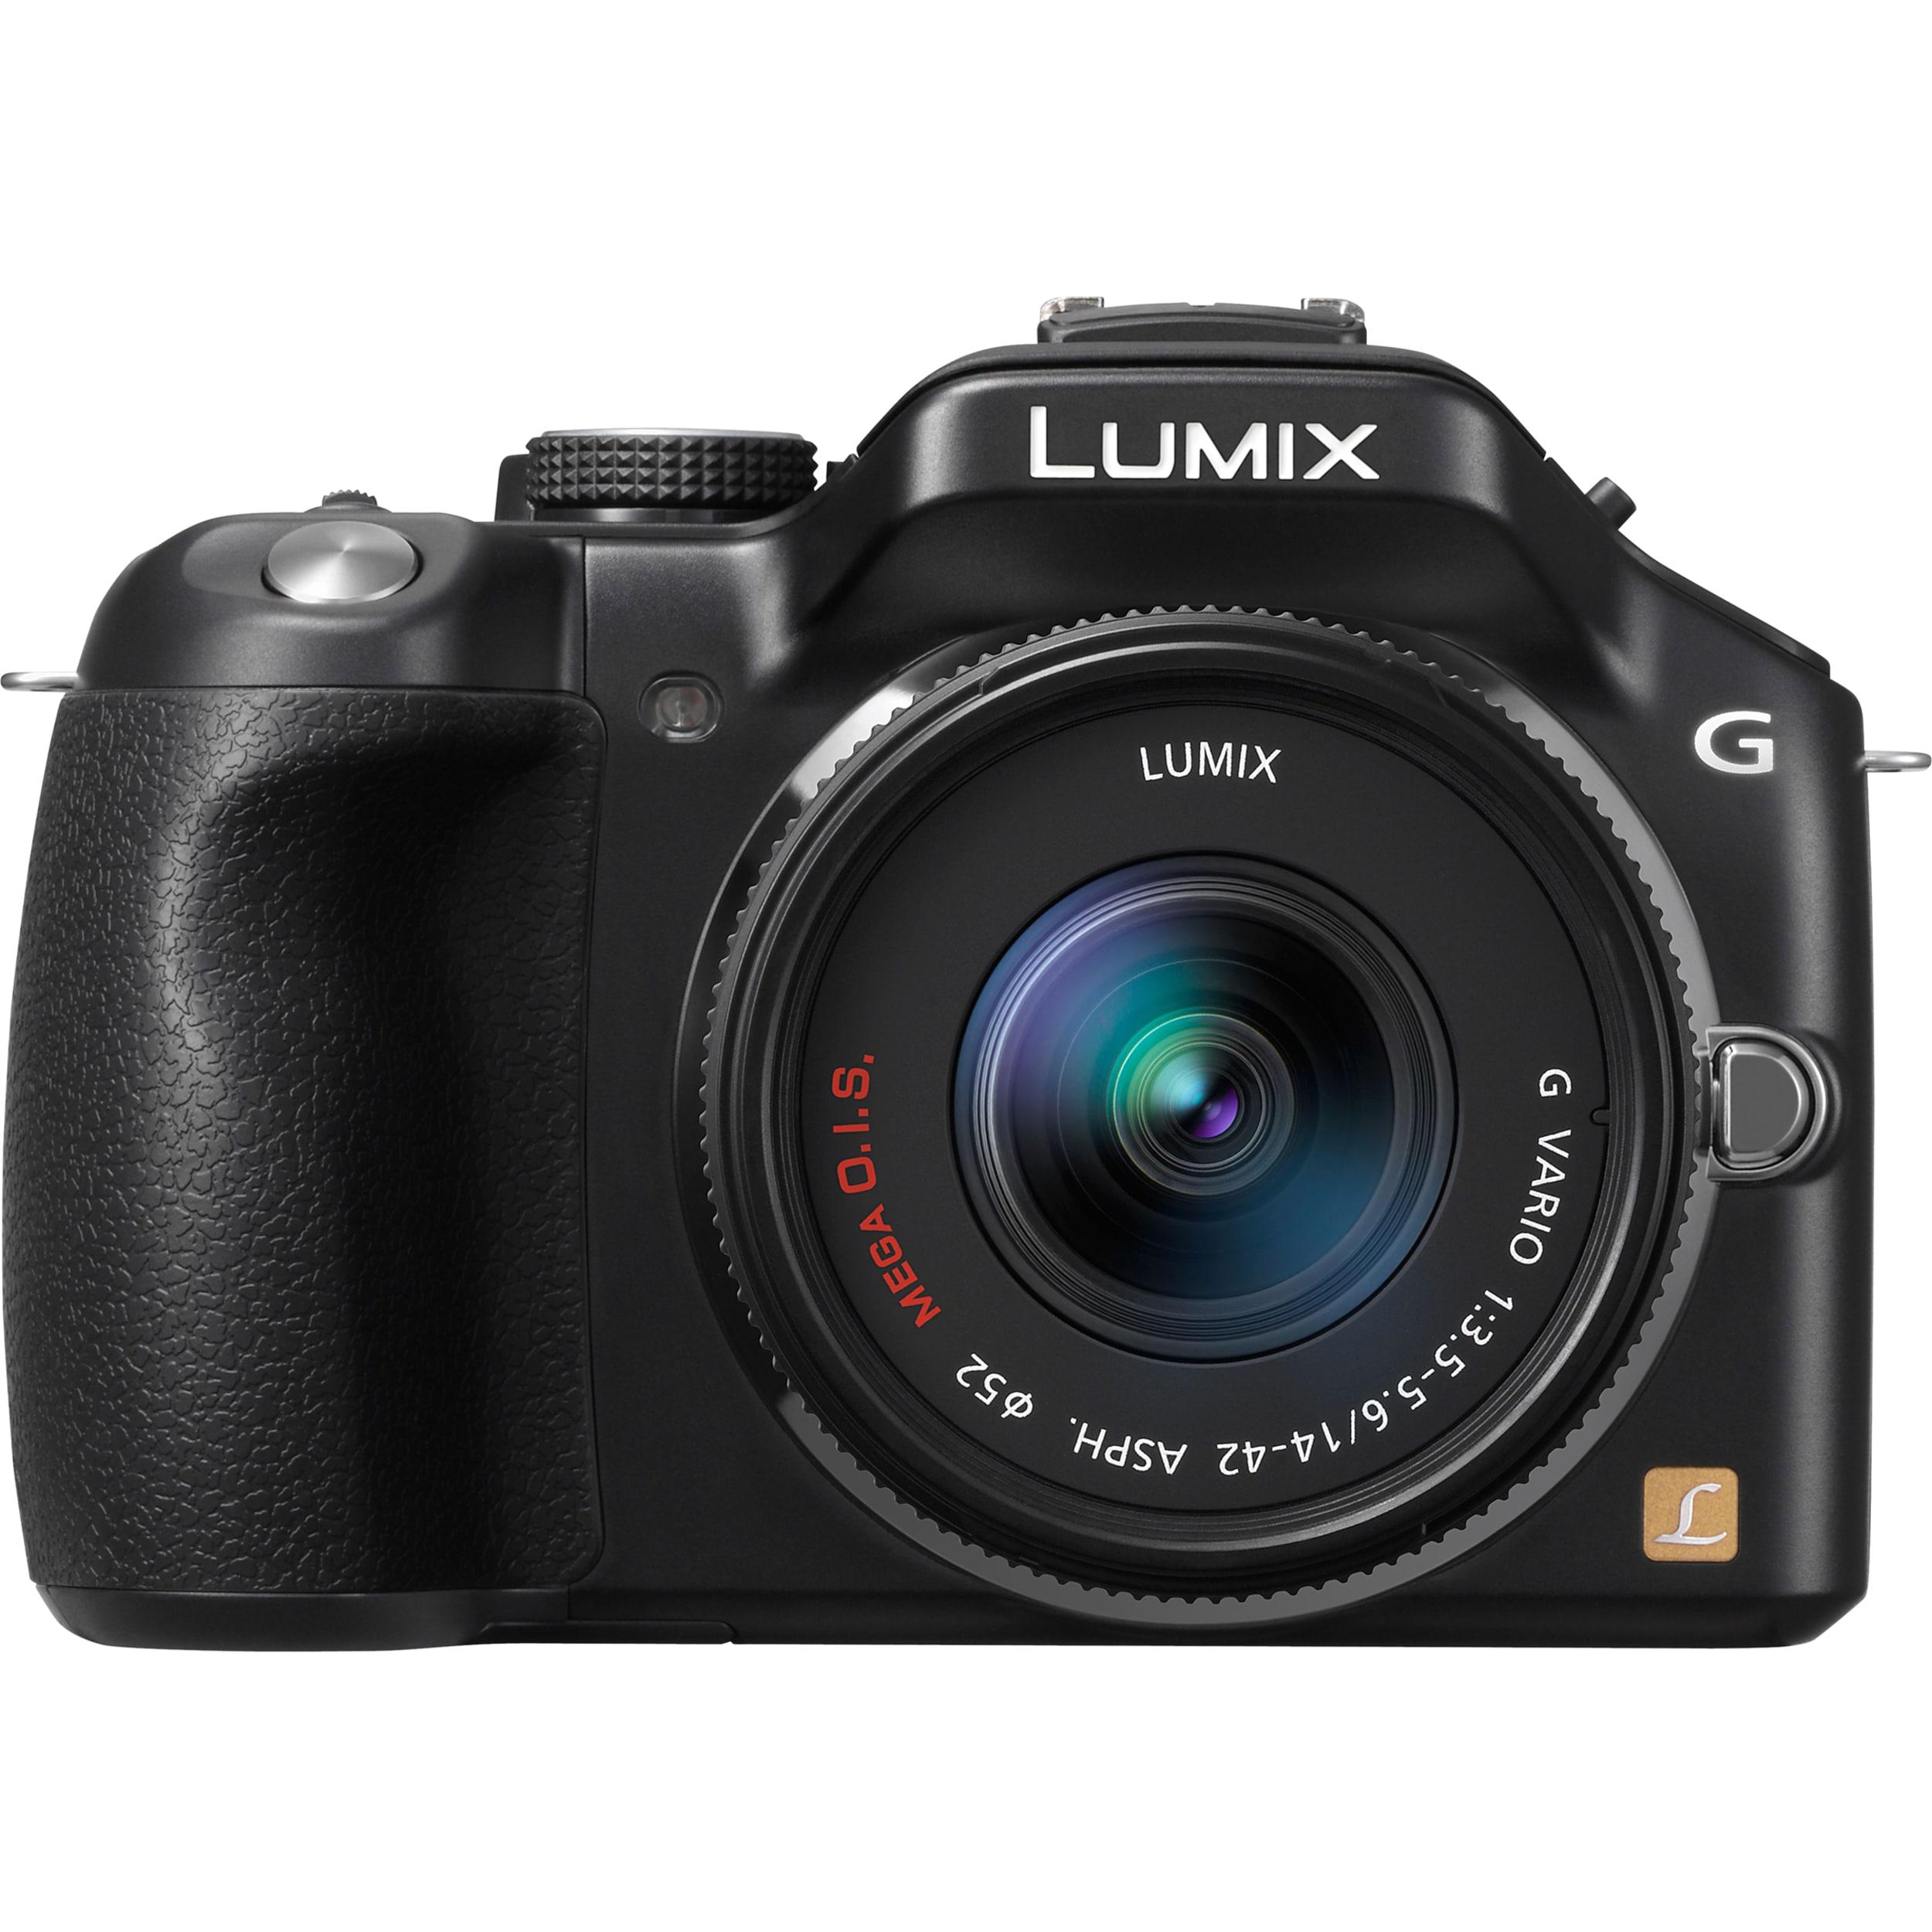 Panasonic Lumix DMC-G5KK 16.1 Megapixel Mirrorless Camera with Lens -